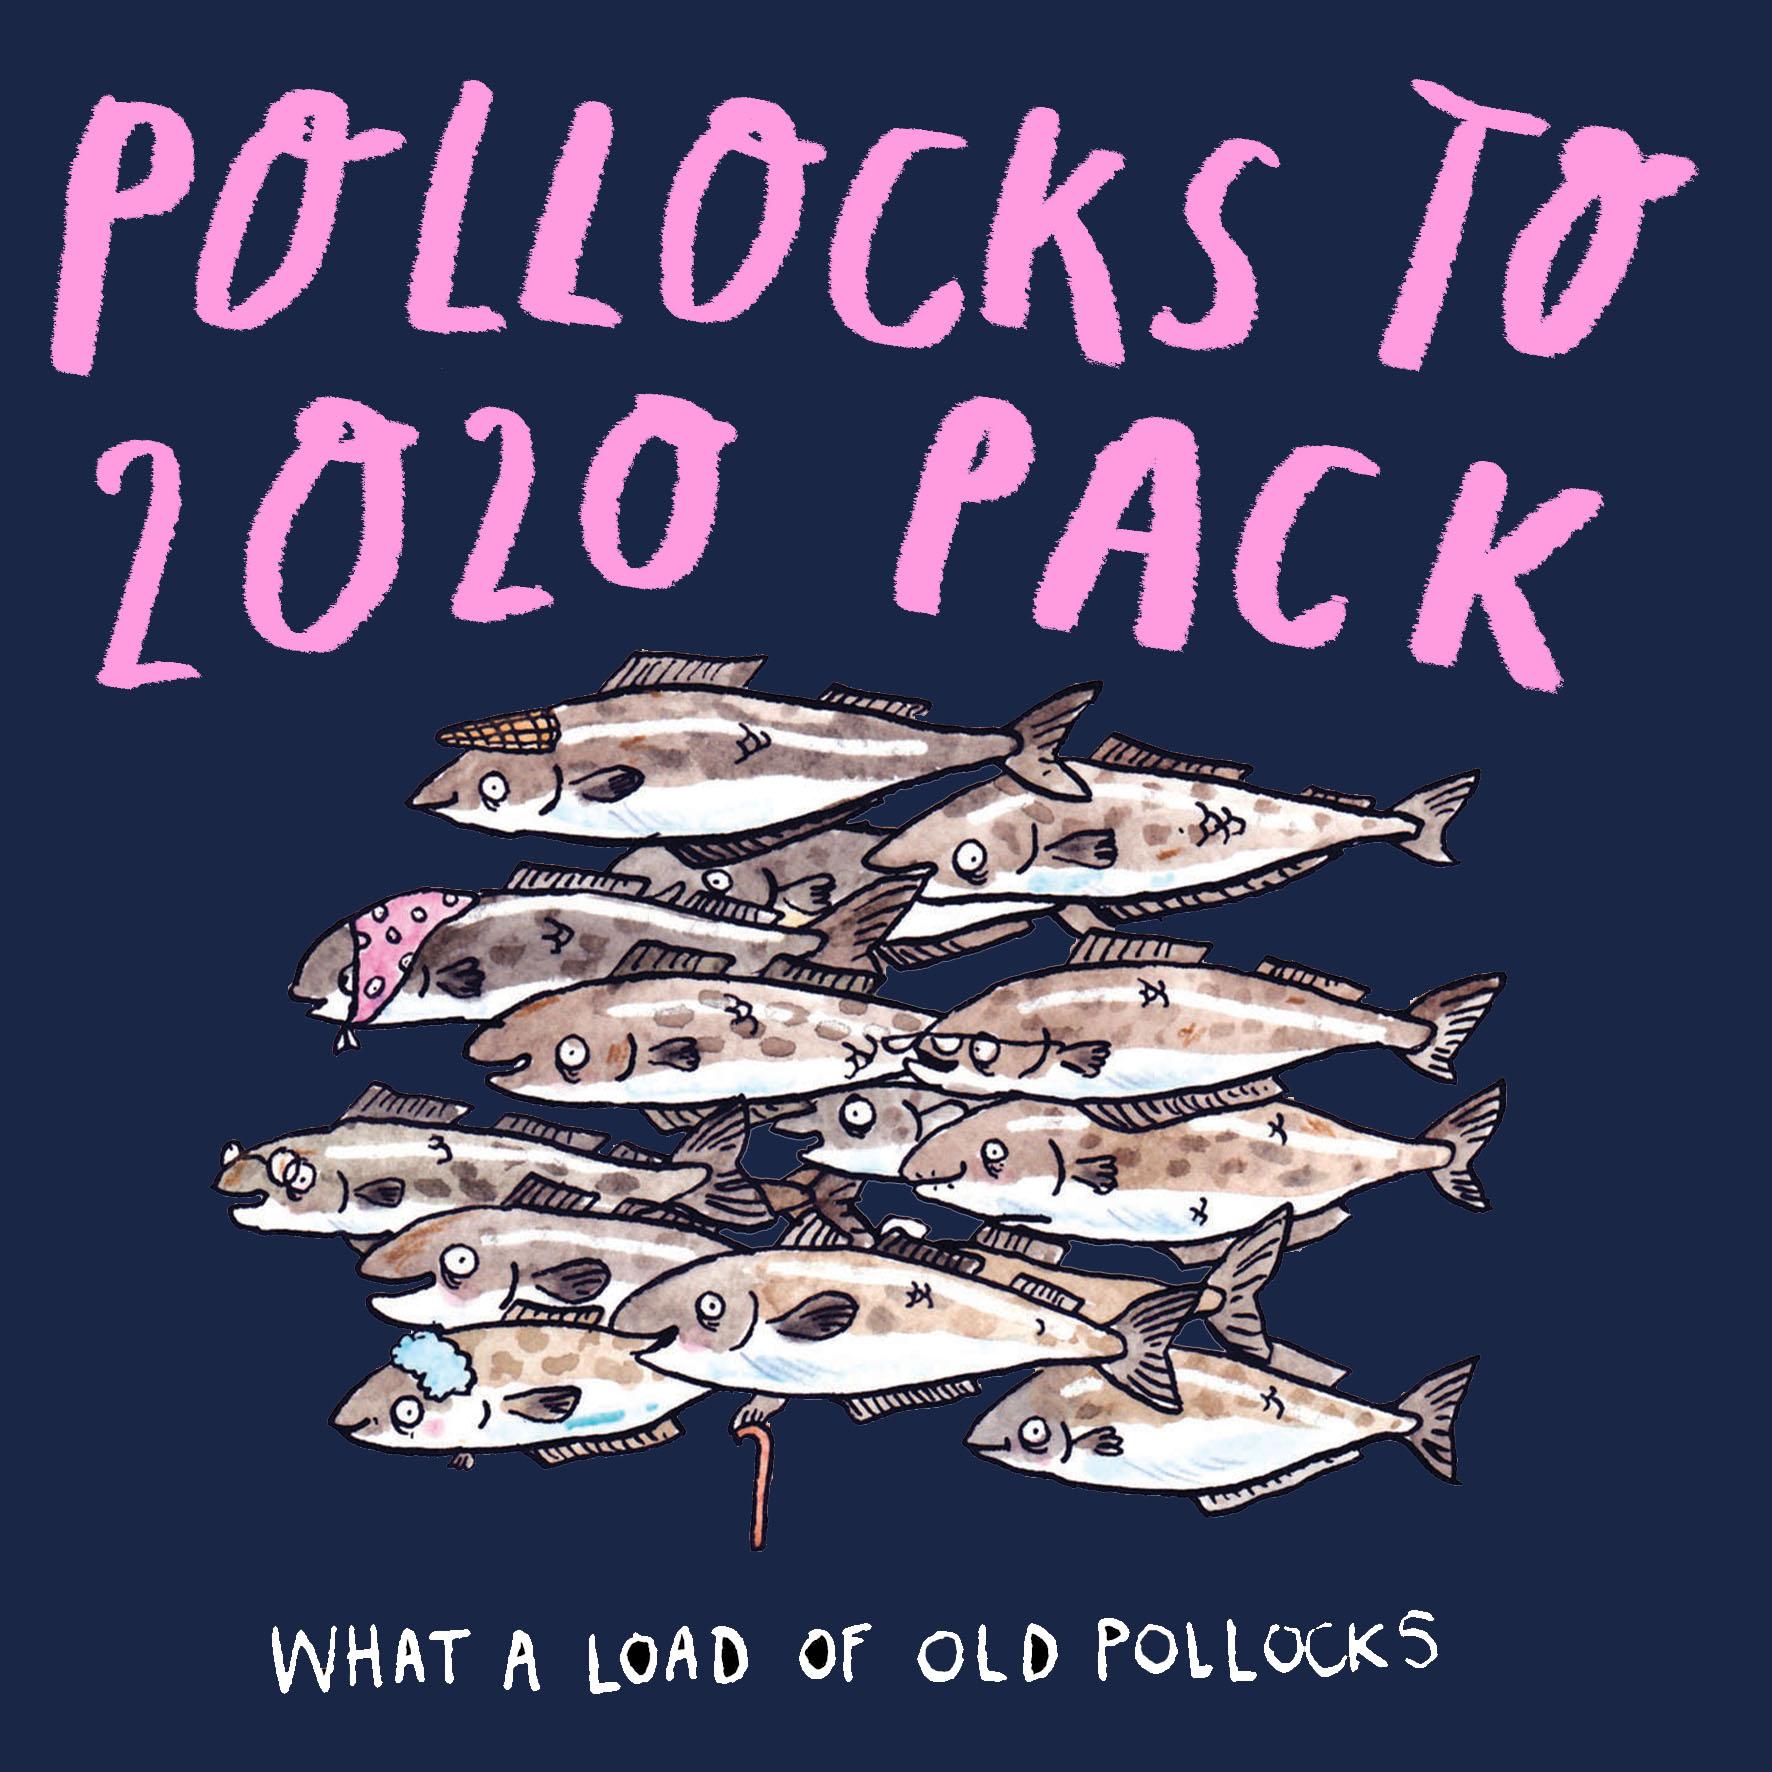 pollocks-1